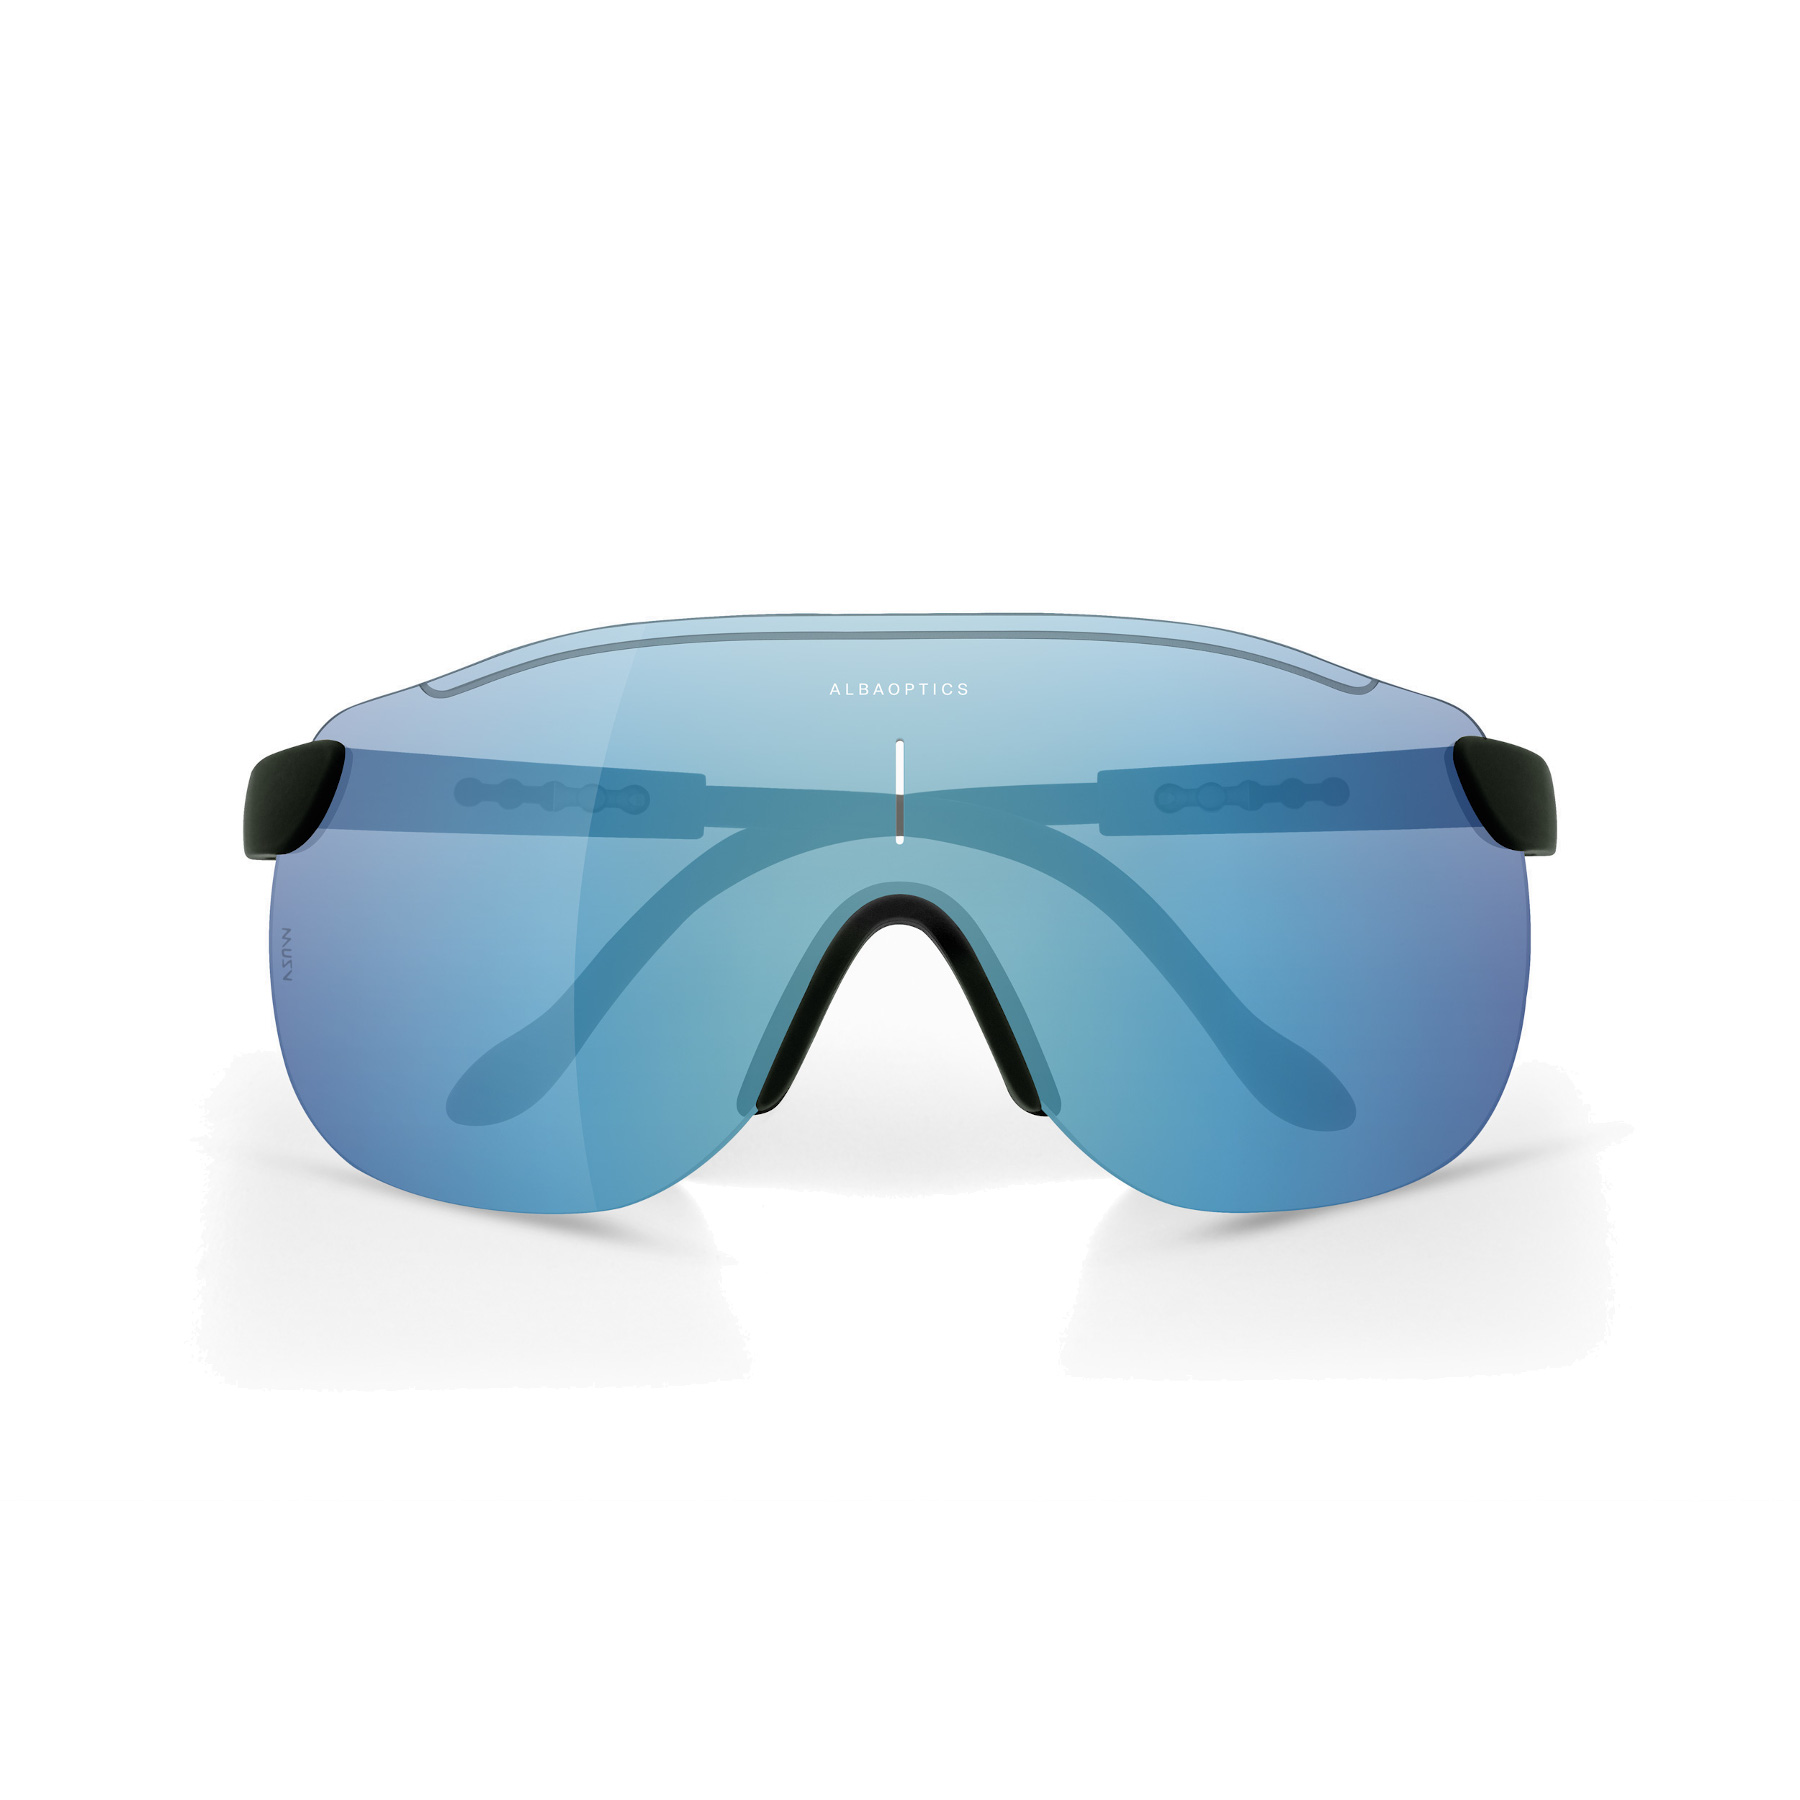 ALBA Stratos Black / ML CIELO Glasses